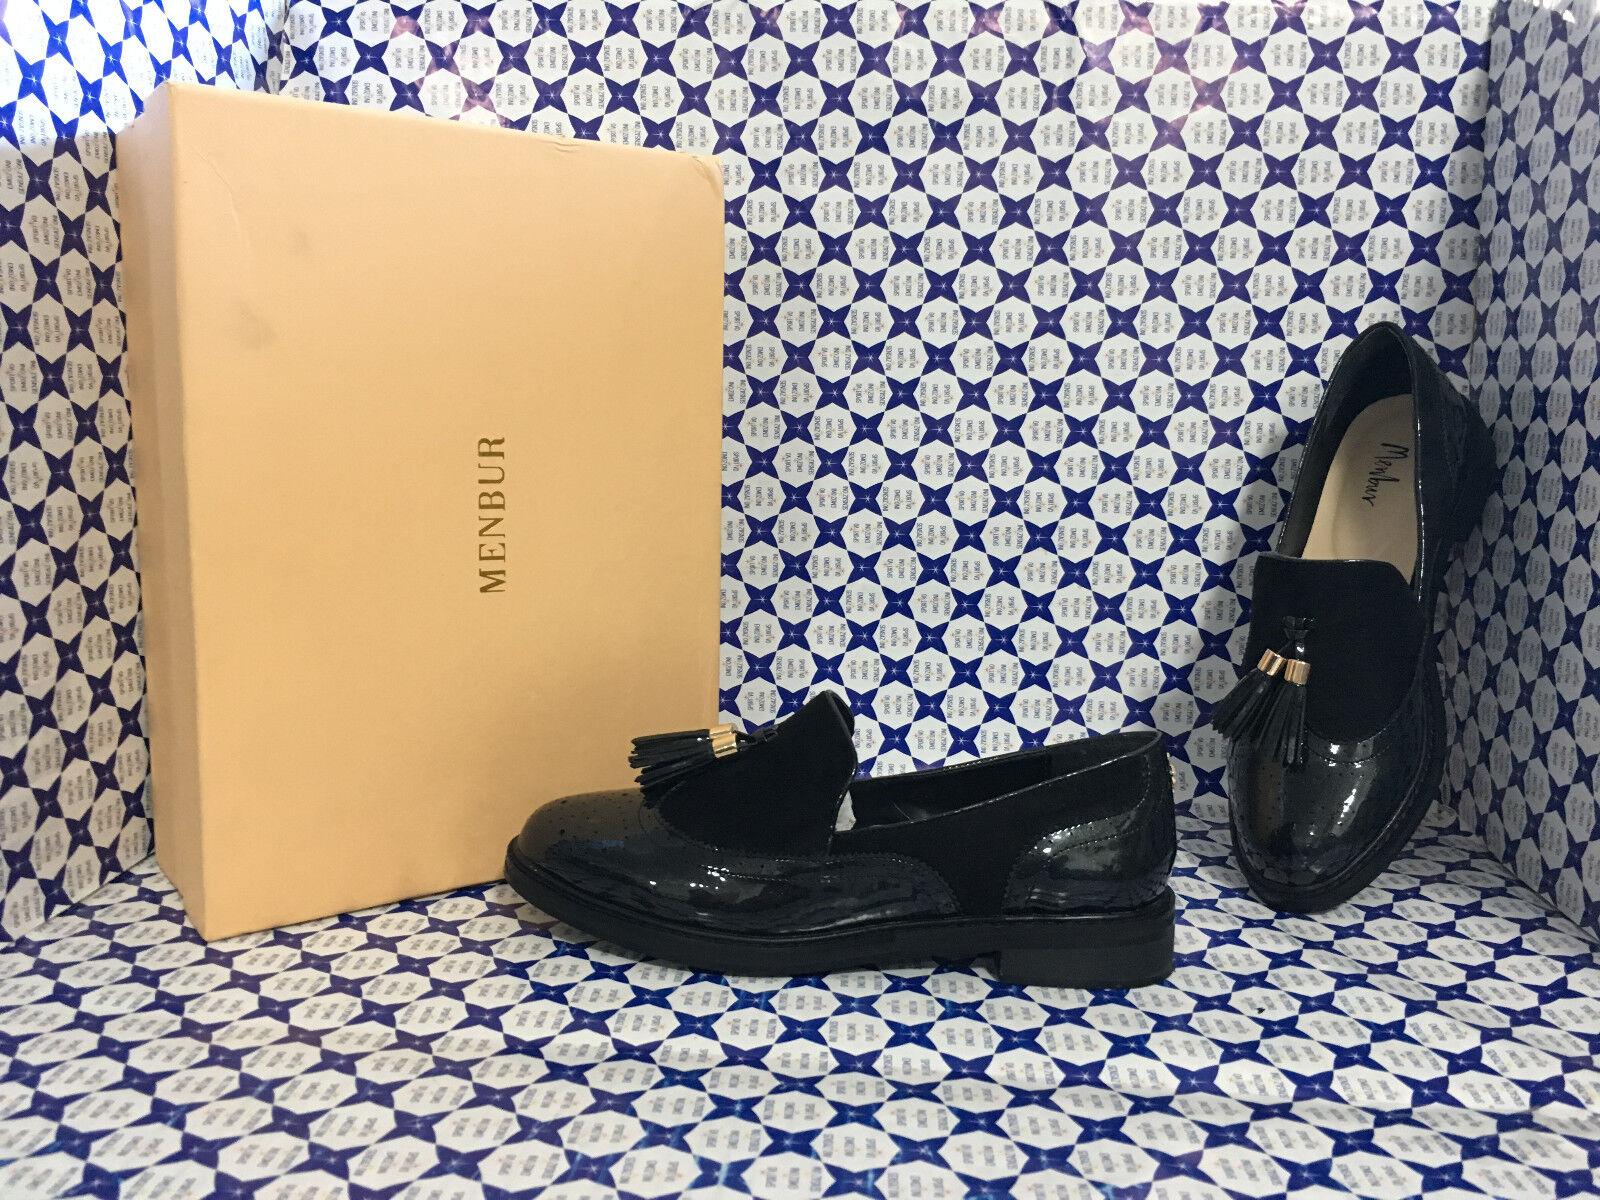 Chaussures Menbur femmes - Mocassino Coda di Rondine Nappine - noir - 7746